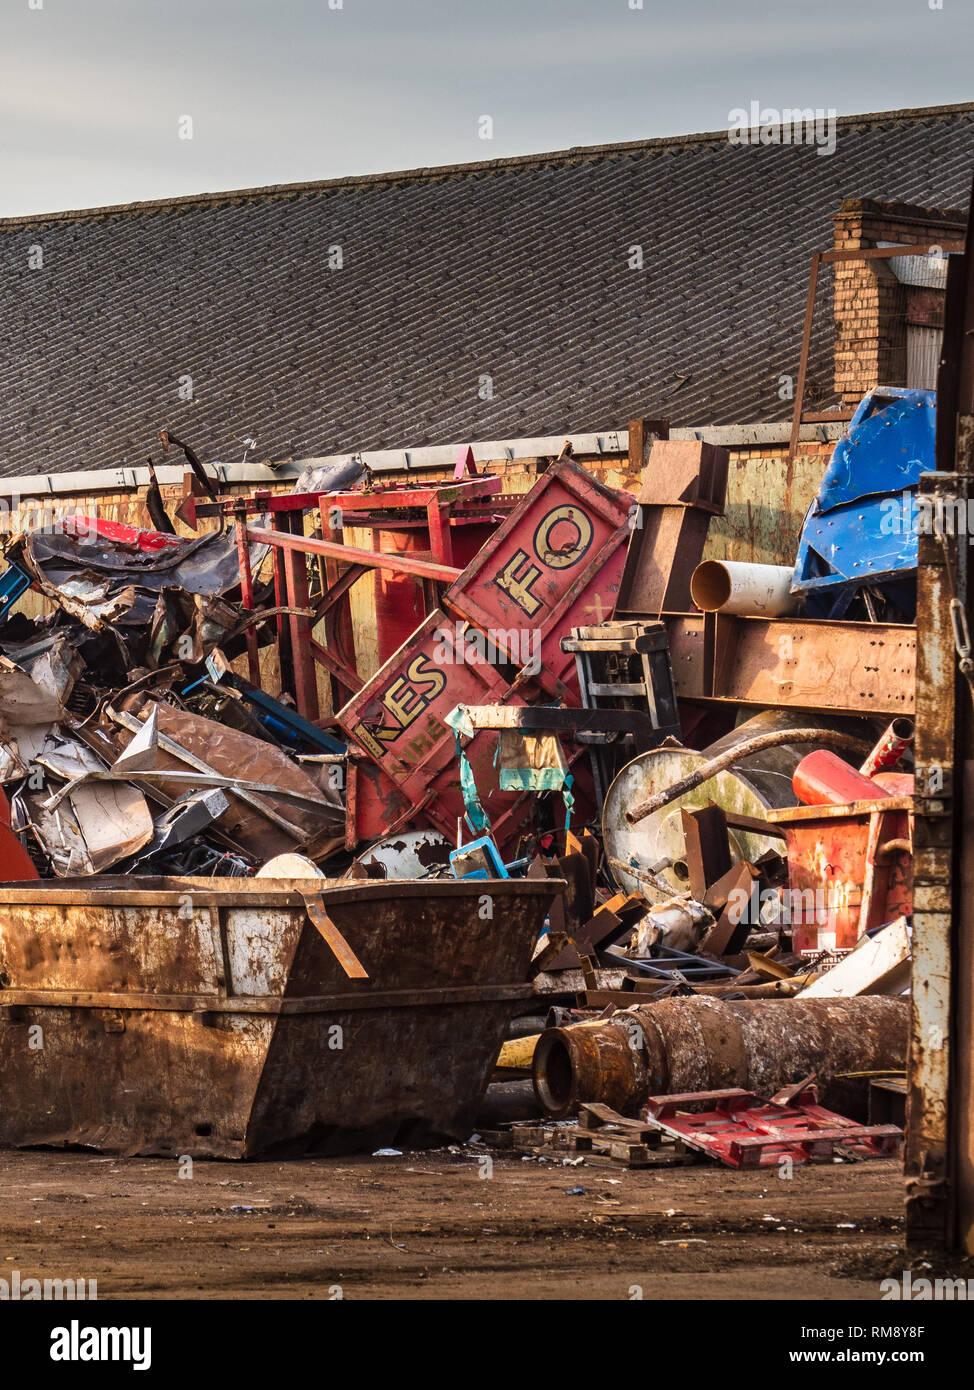 Scrapyard - Metal Recycling Yard - recycling scrap metals Stock Photo